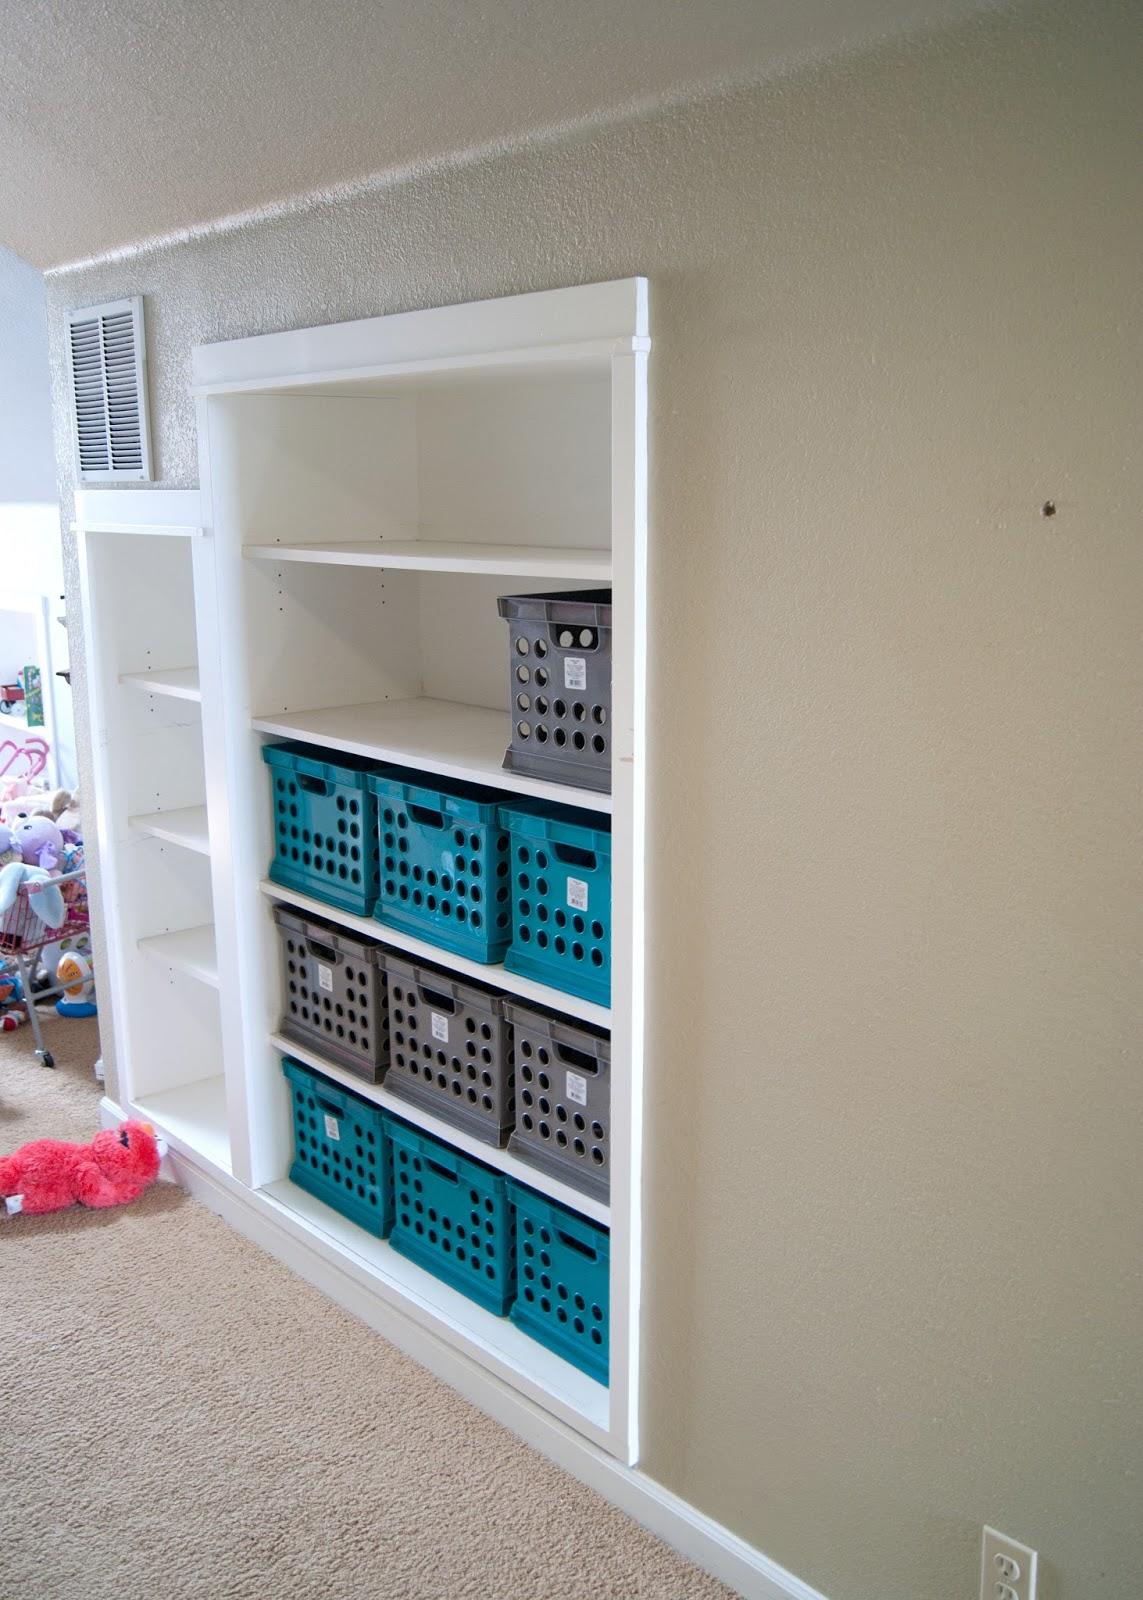 Hallway Toy Storage Makeover Averie Lane Hallway Toy Storage Makeover Jpg  1143x1600 Milk Crate Storage Bins